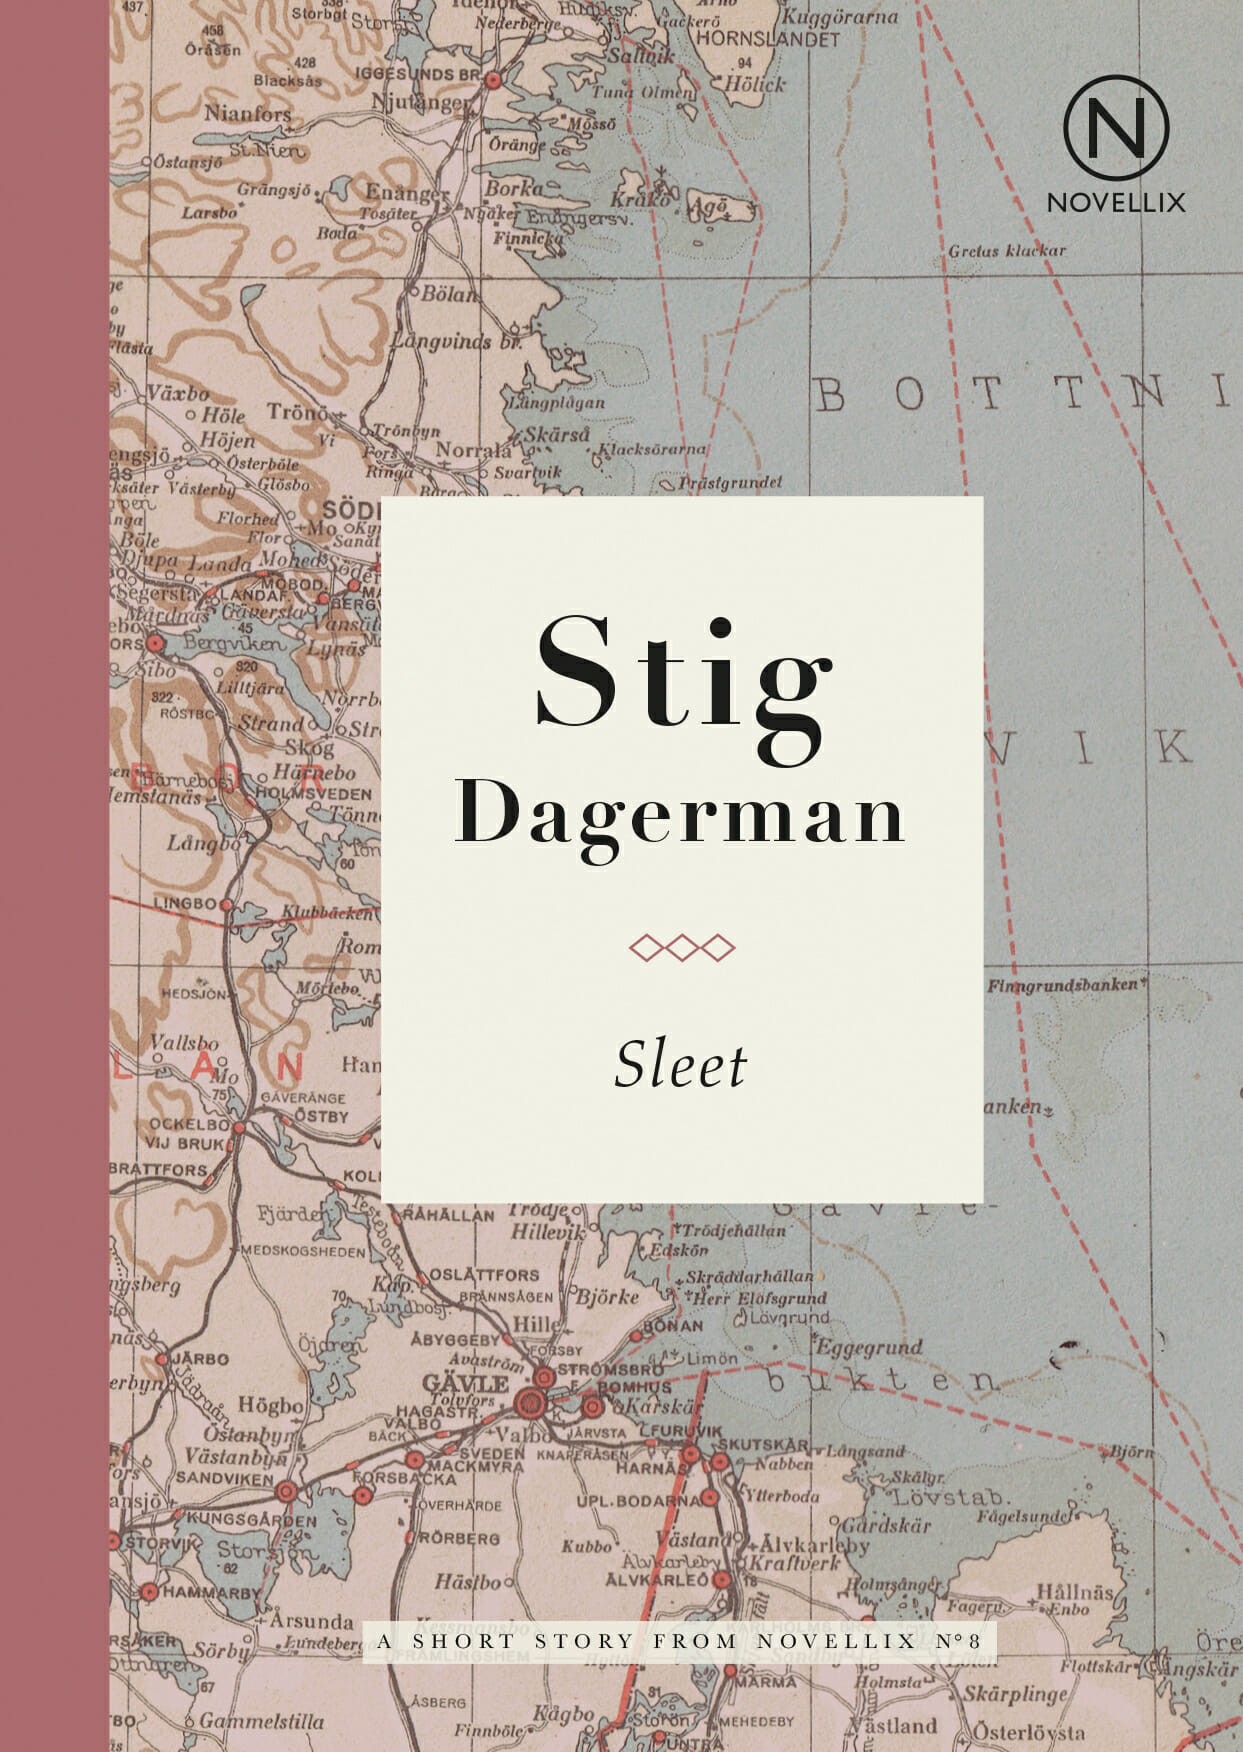 stig dagerman sleet short story novell